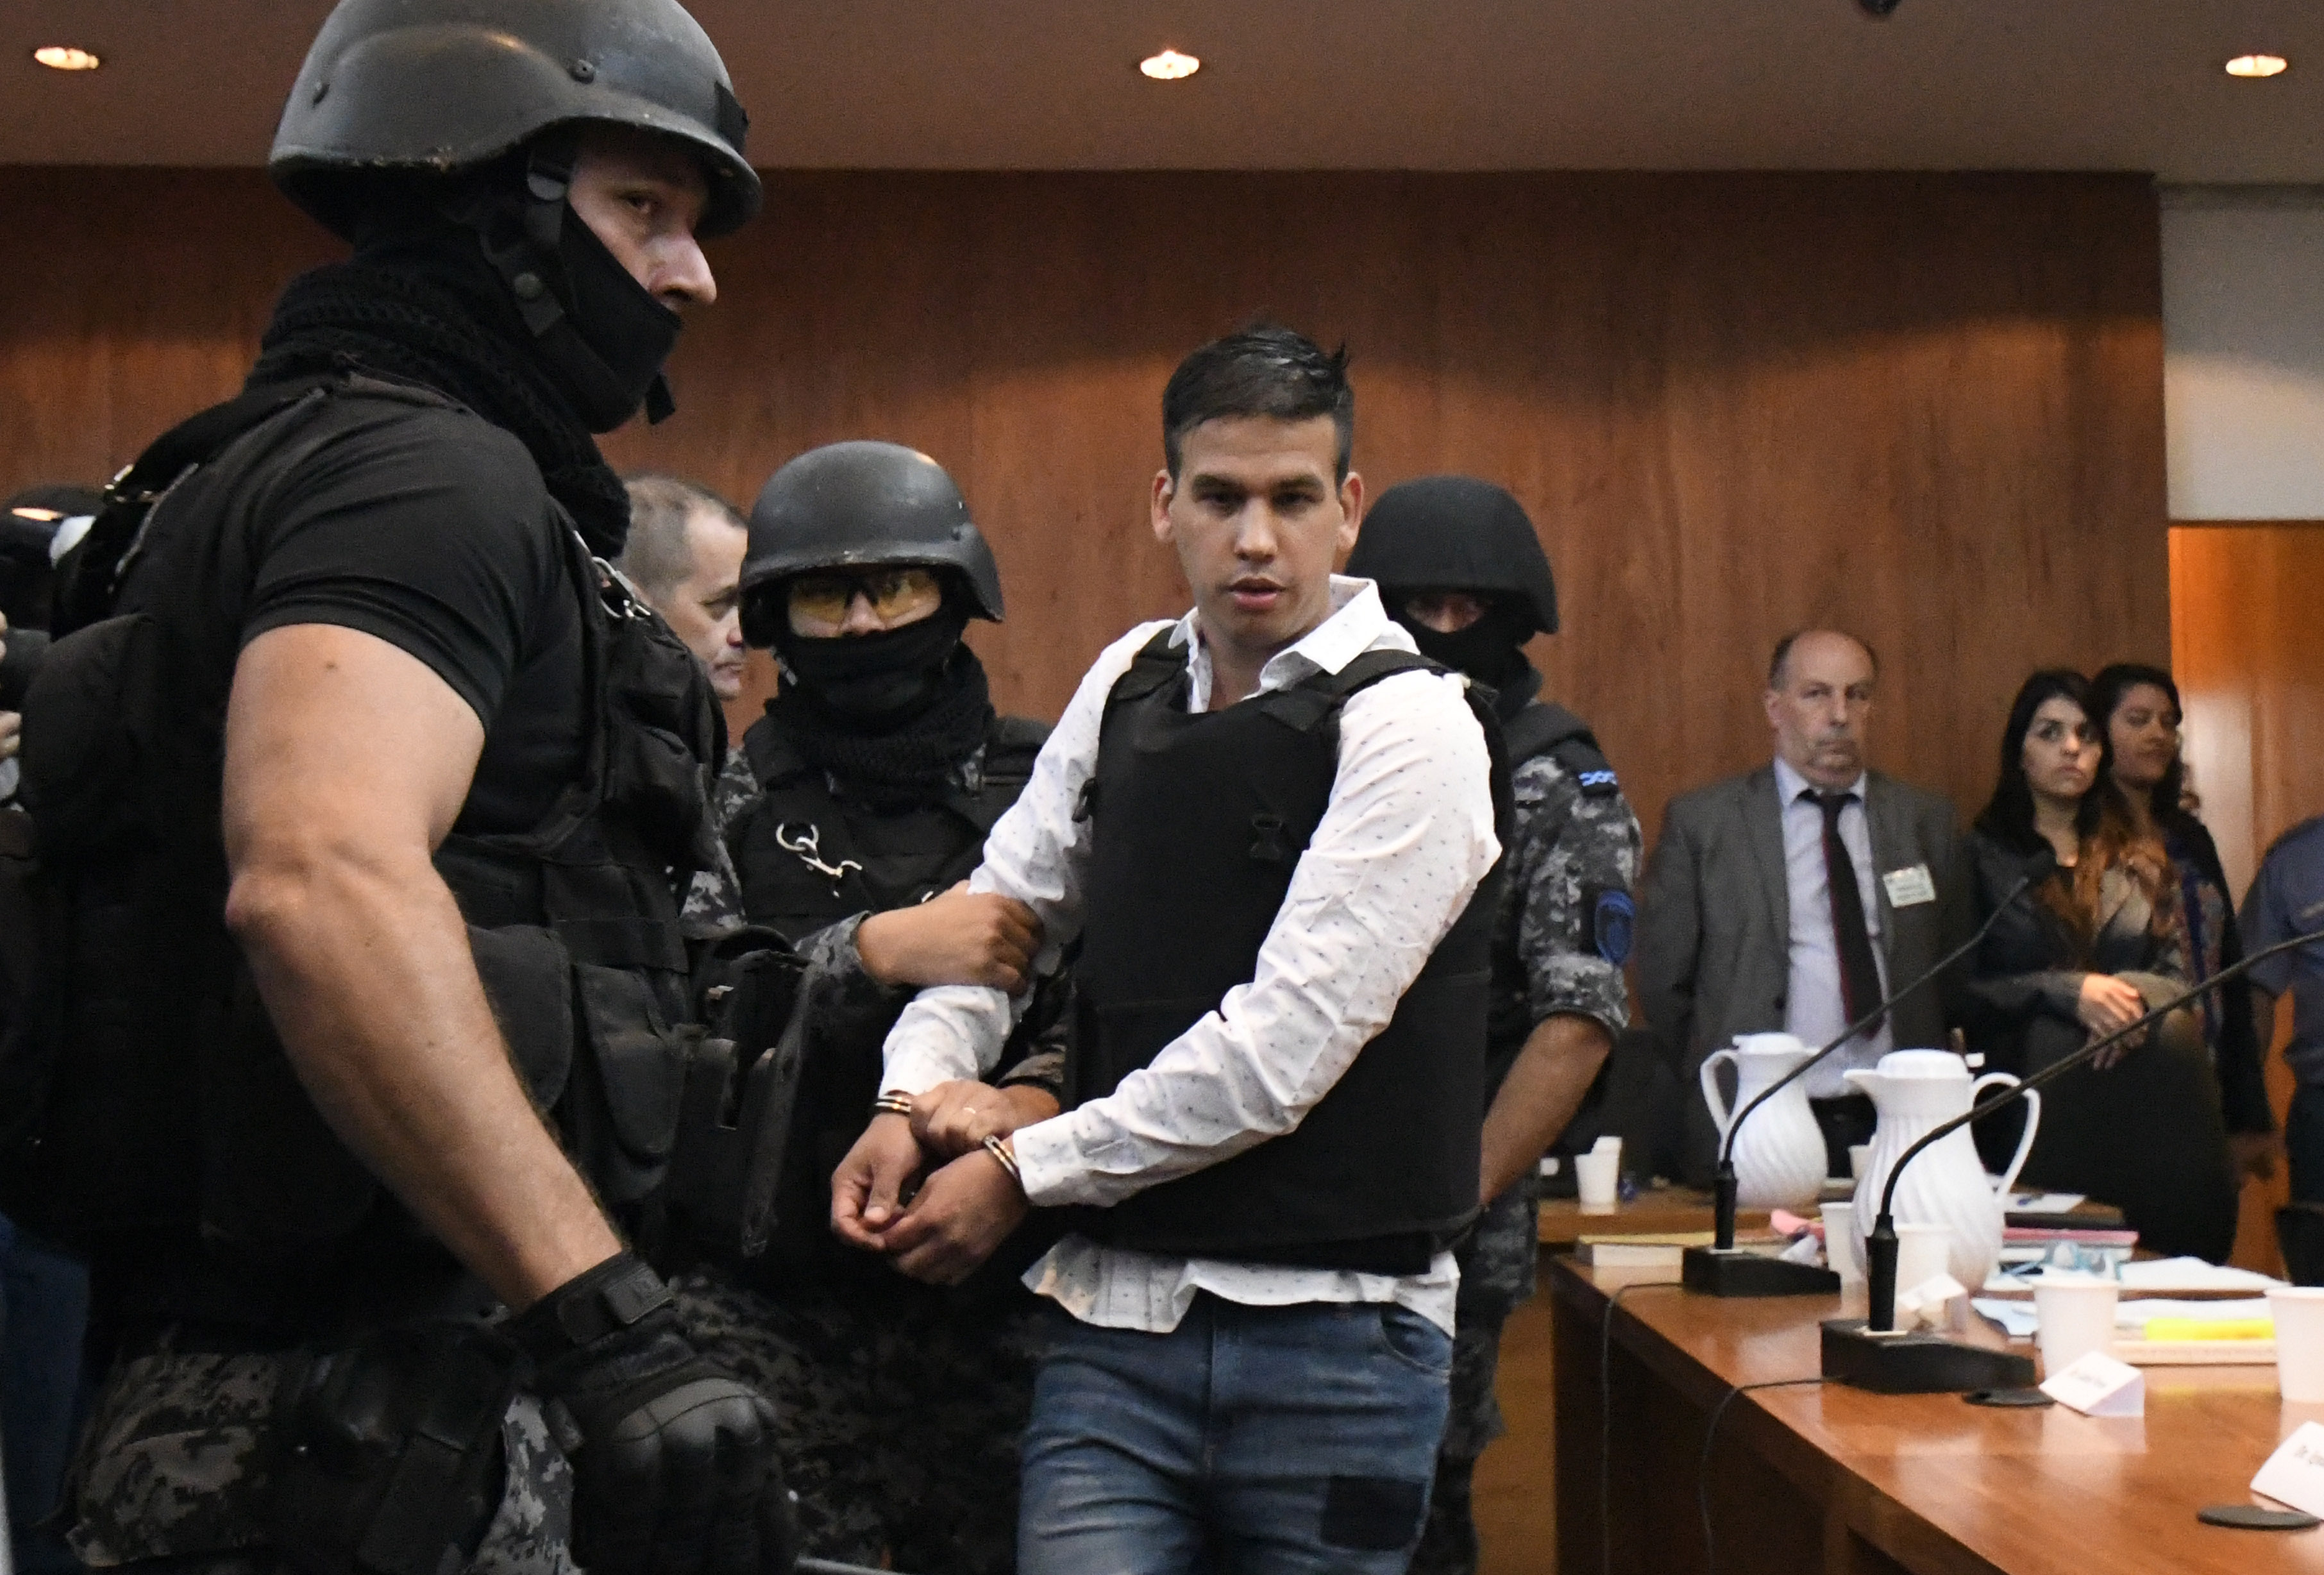 Machuca negó que haya encargado asesinatos, tal como se le acusa.